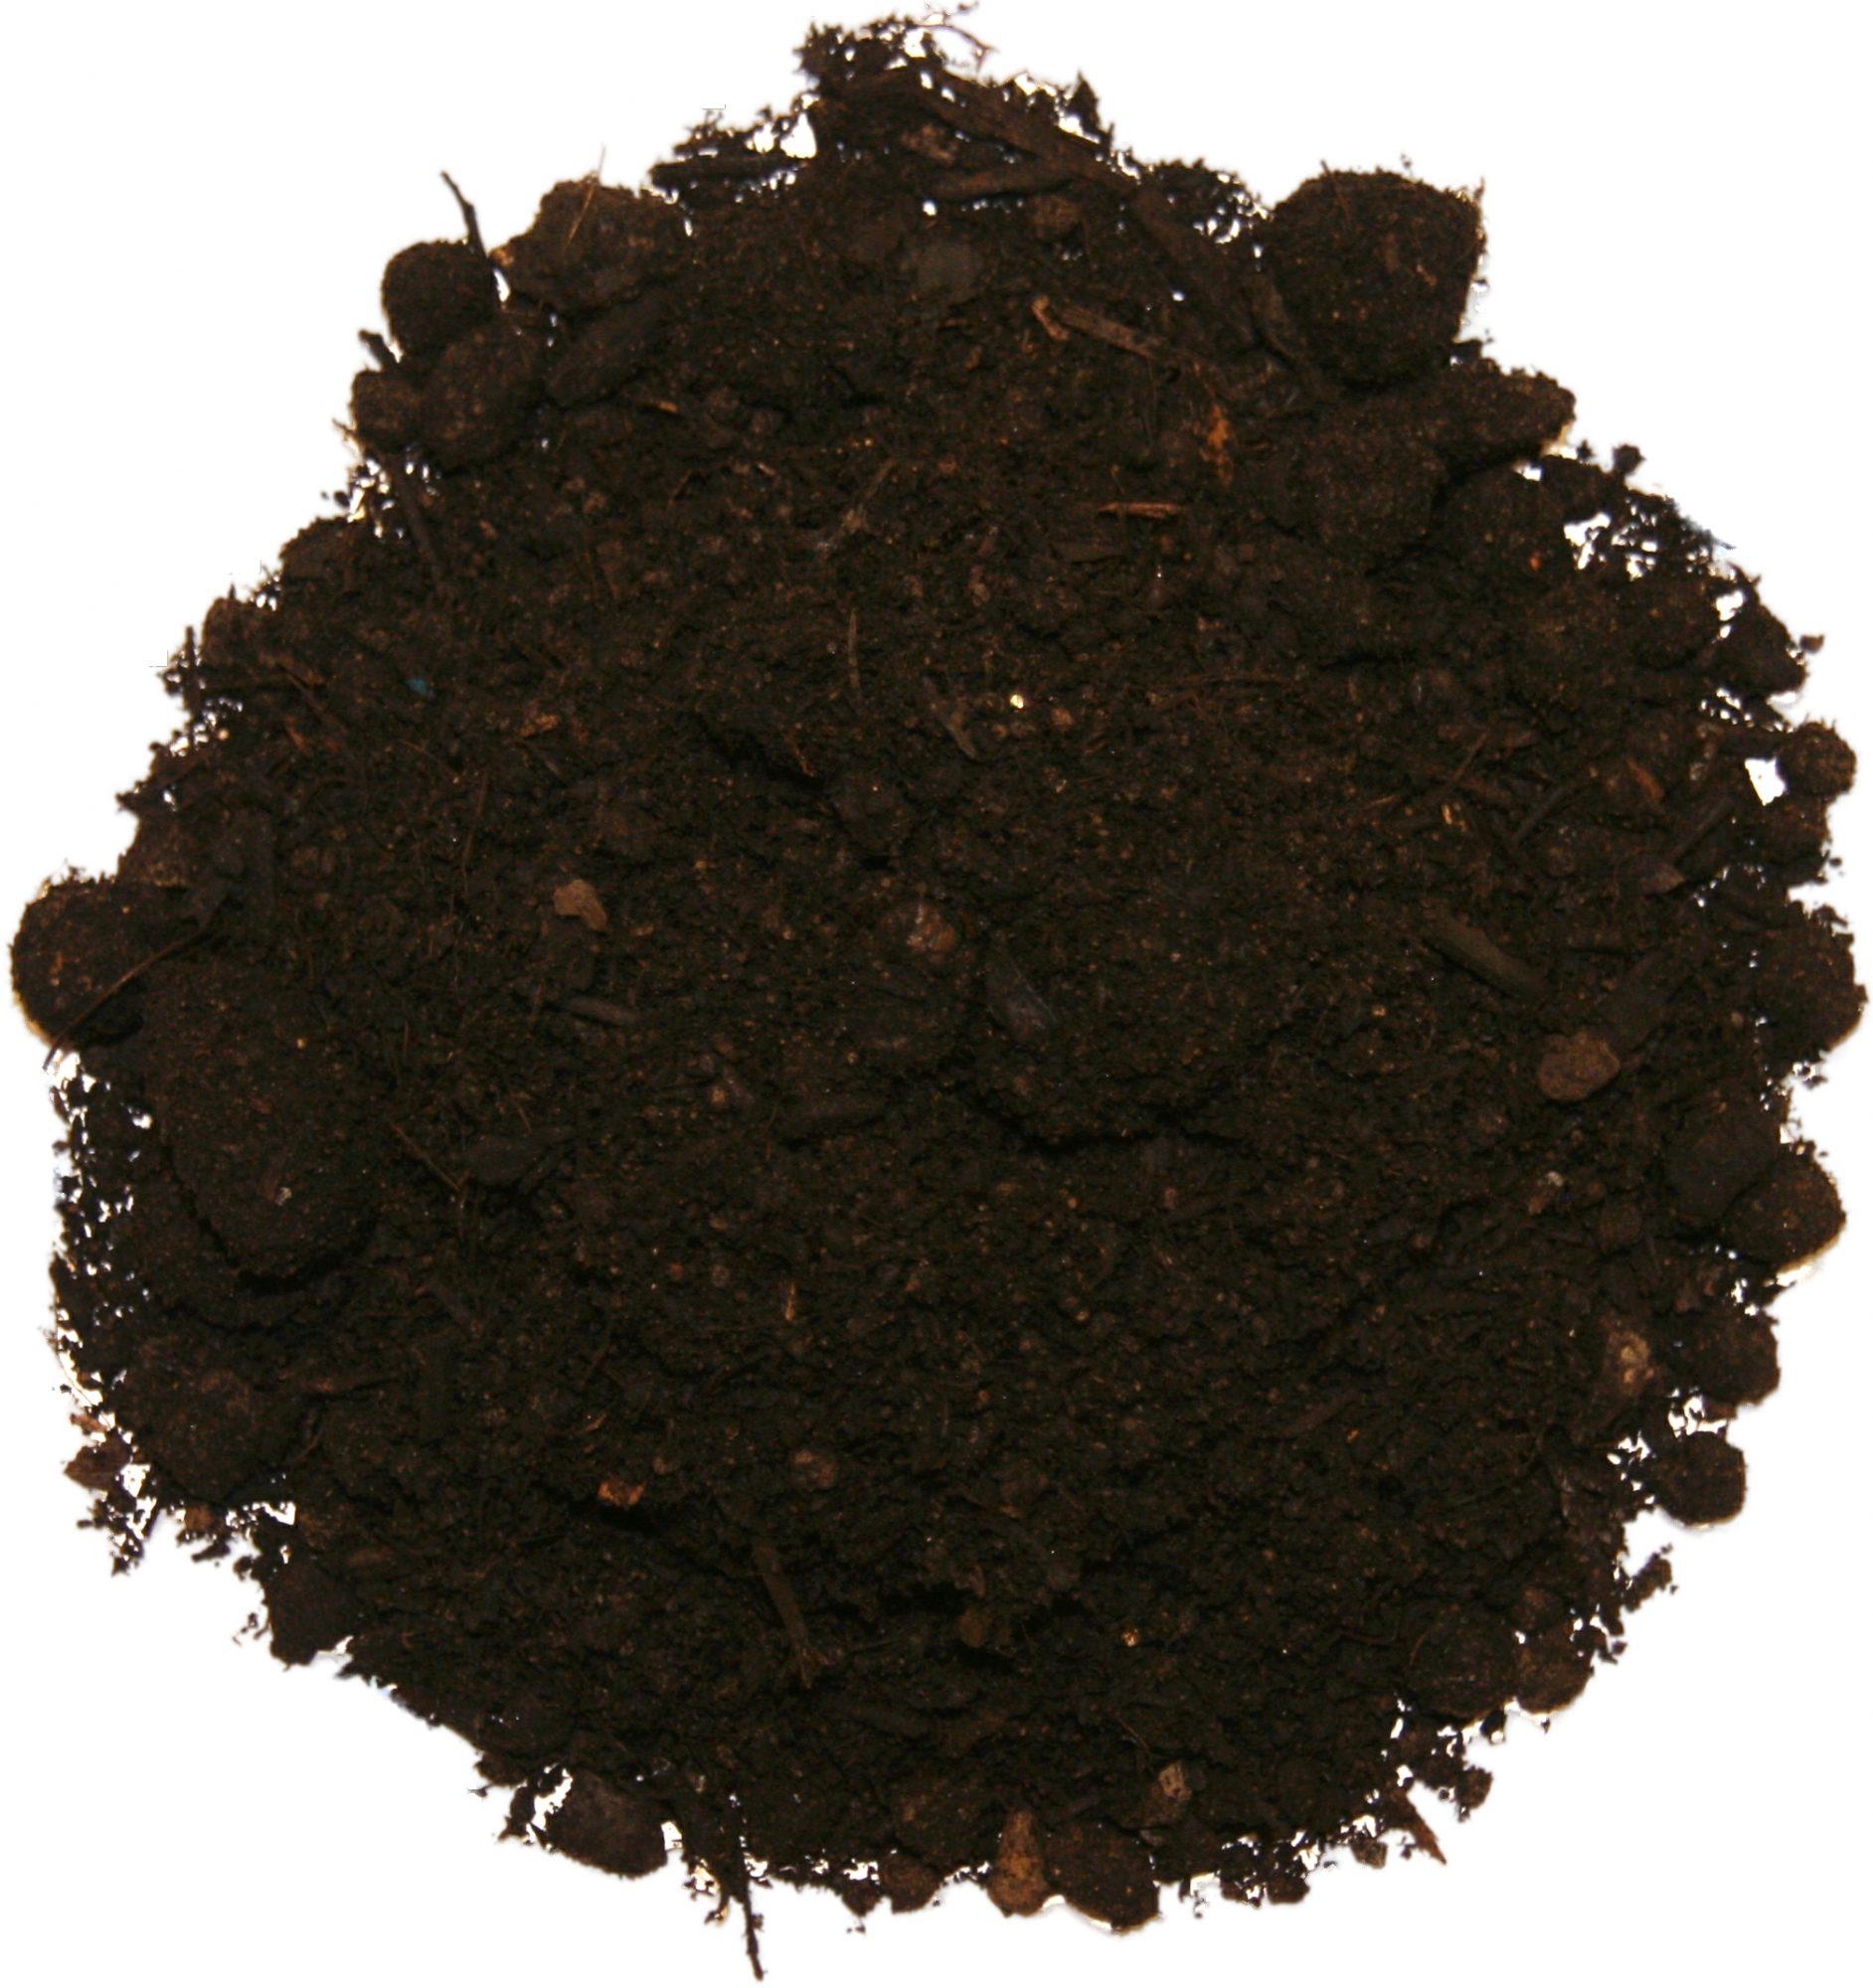 Black Gold Compost | Compost Direct Ltd - Compost Direct